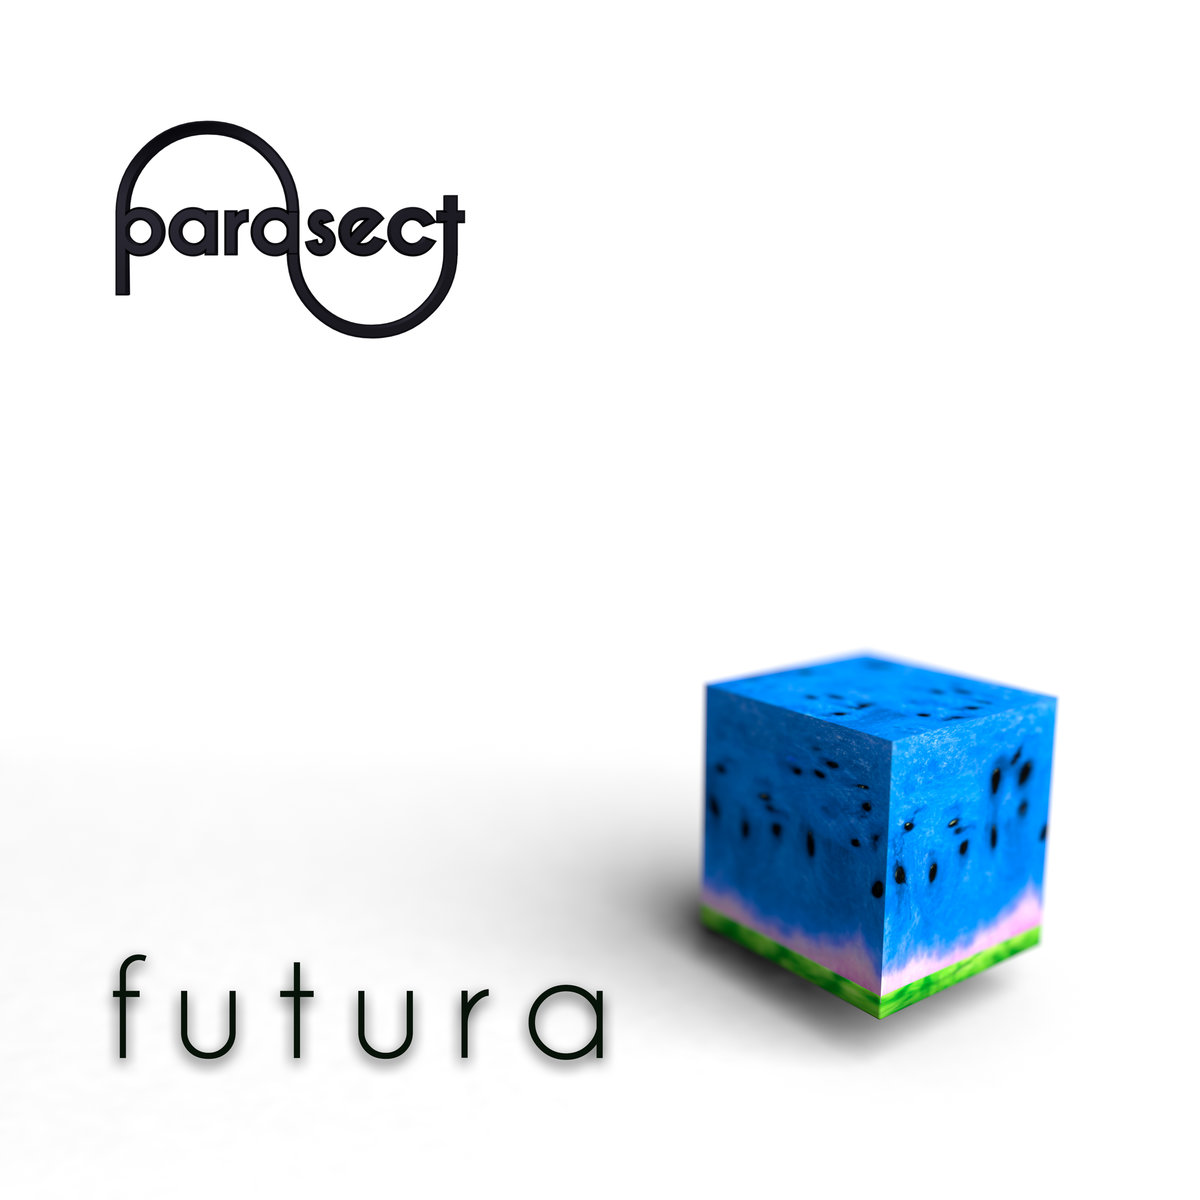 Parasect - Futura (Bom Shanka Music, London) Mastering